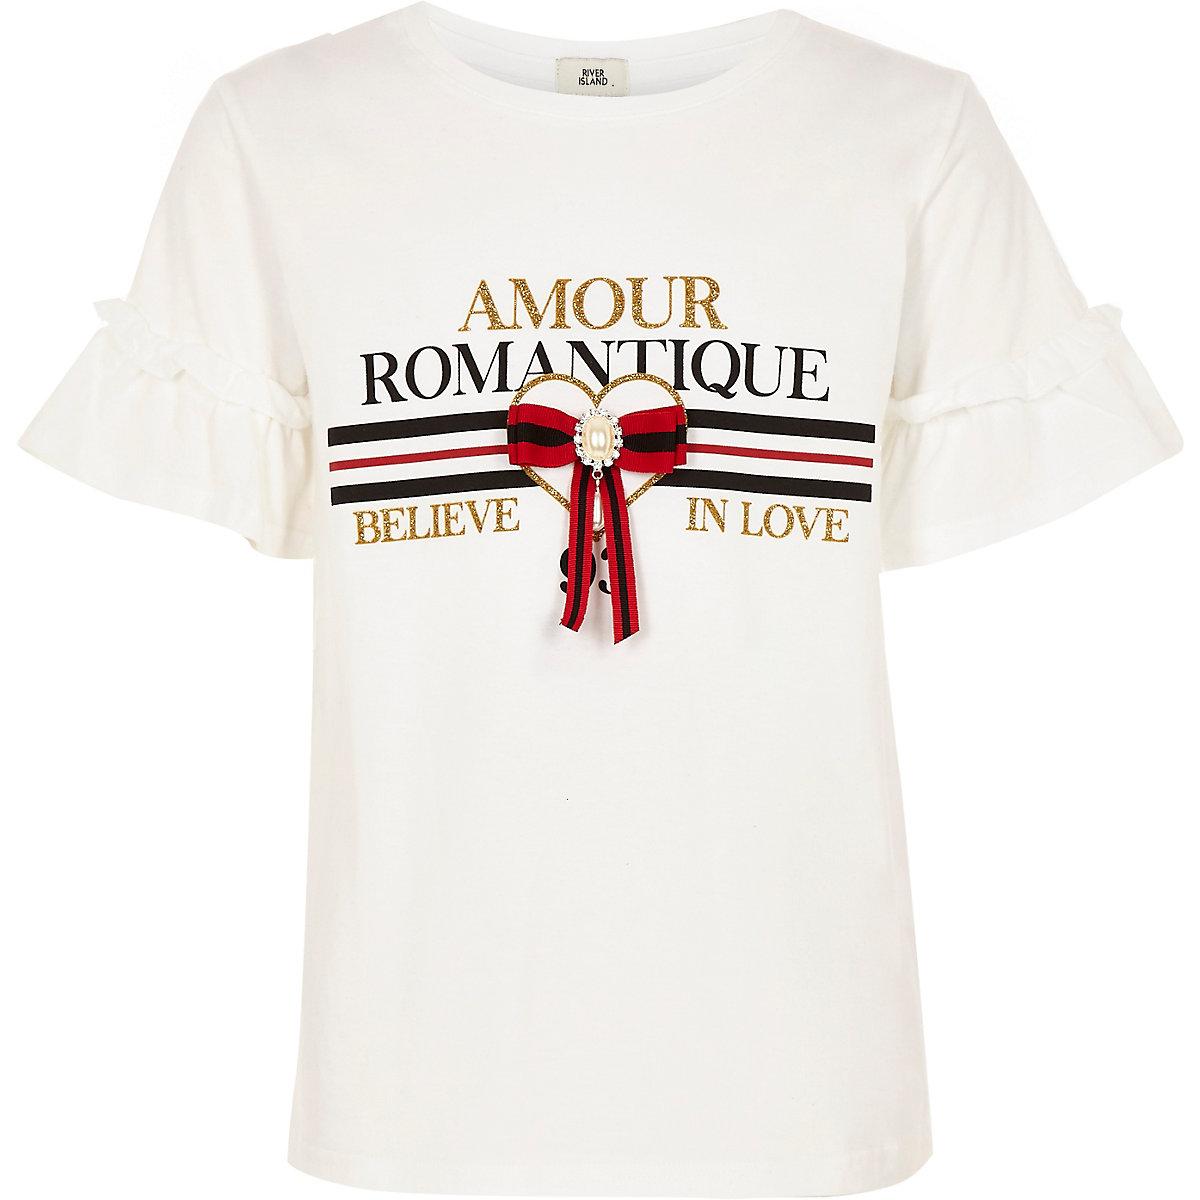 Girls white 'Amour' frill sleeve T-shirt